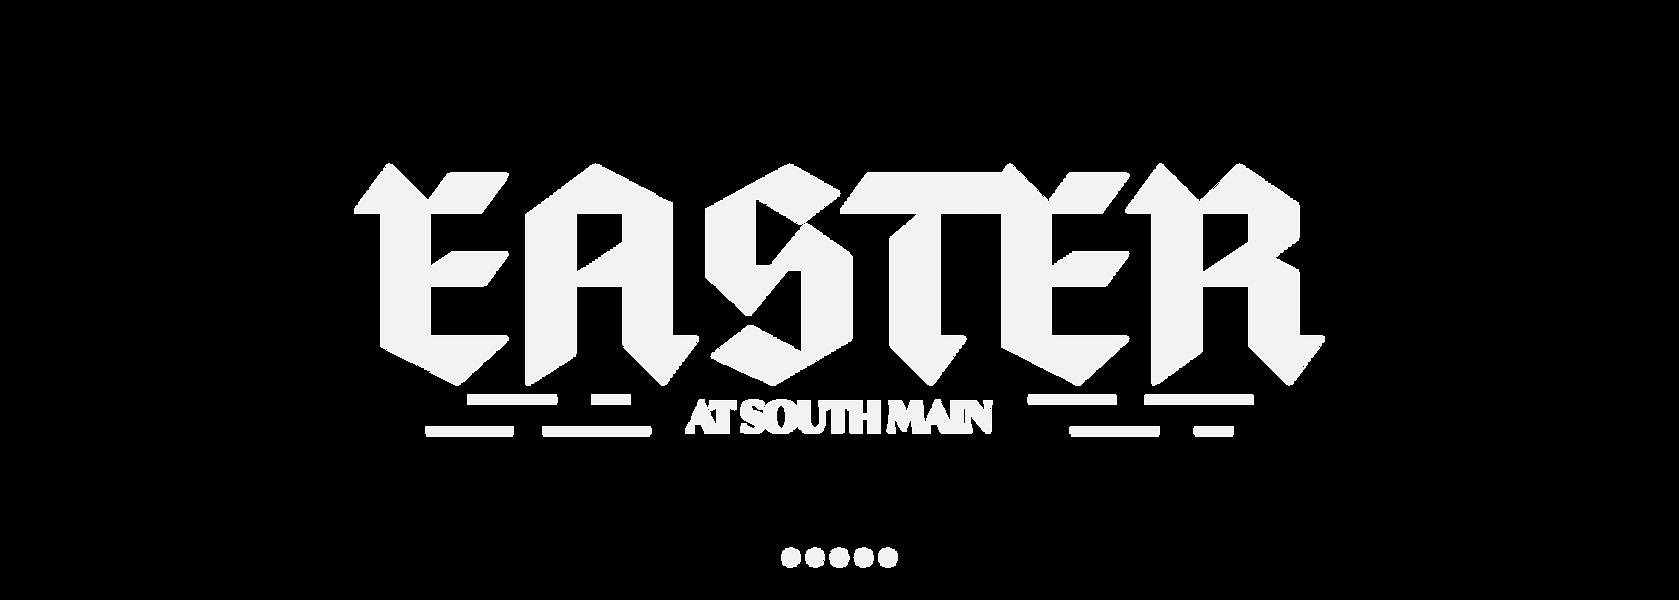 easter21_website_hero_logo.png